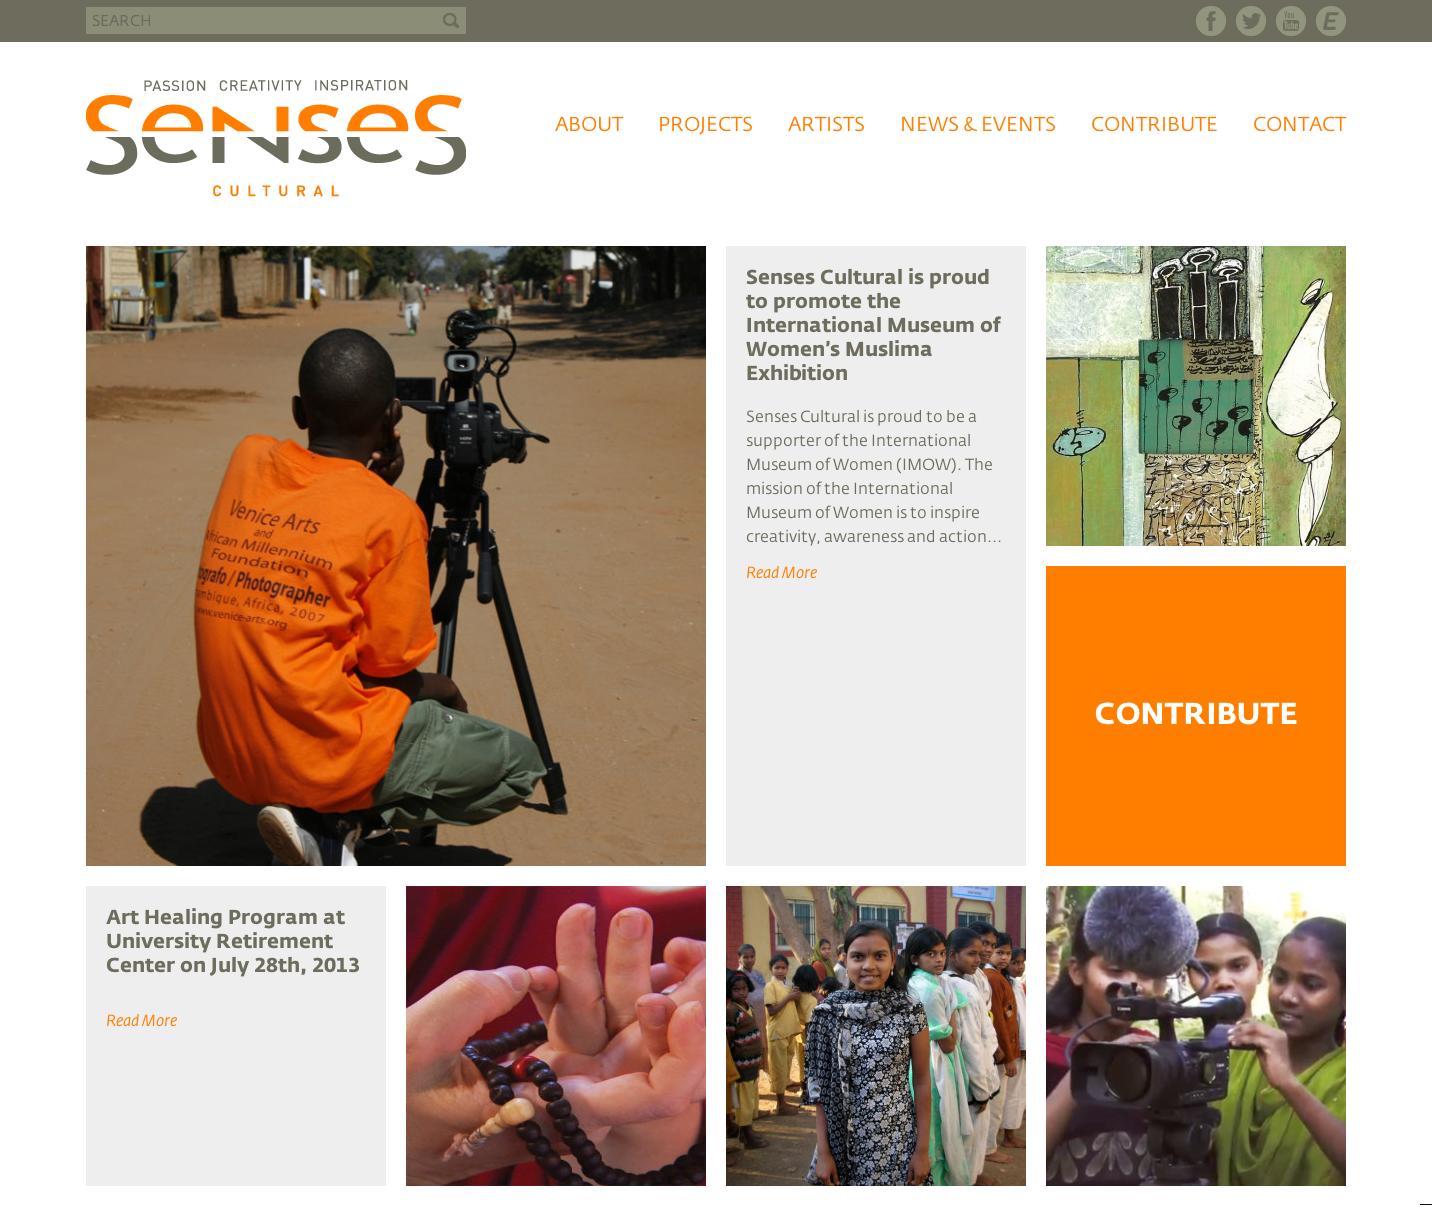 Project image 1 for Website, Senses Cultural